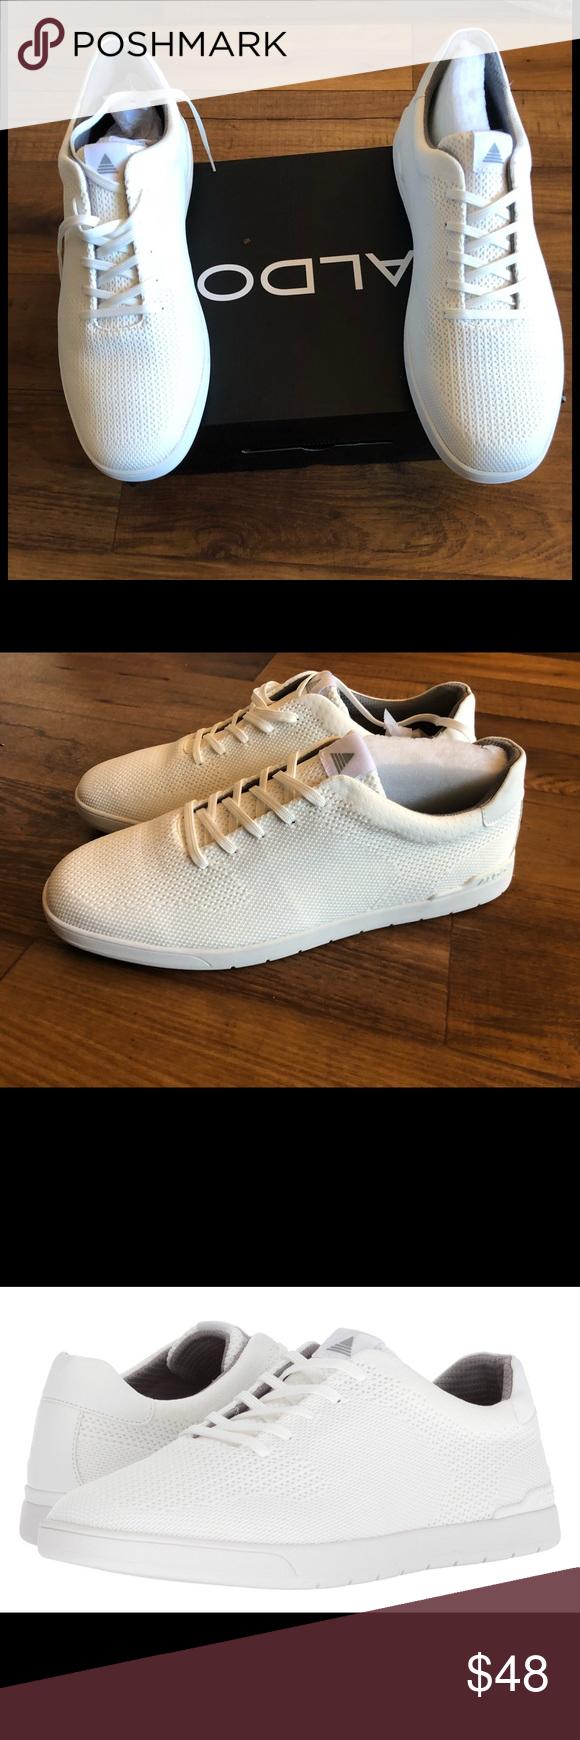 Sneakers, Lacing sneakers, Lace sneakers